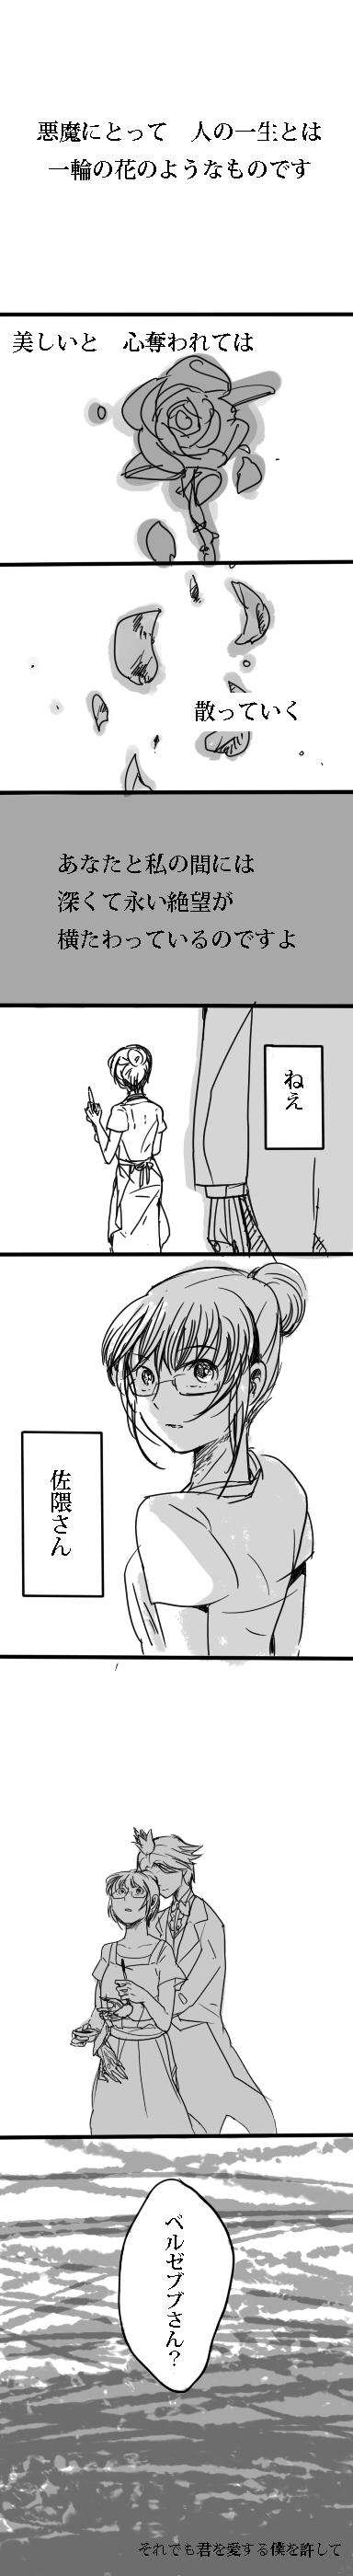 Tags: Anime, Pixiv Id 3208124, Yondemasuyo Azazel-san, Sakuma Rinko, Beelzebub (Yondemasuyo Azazel-san)